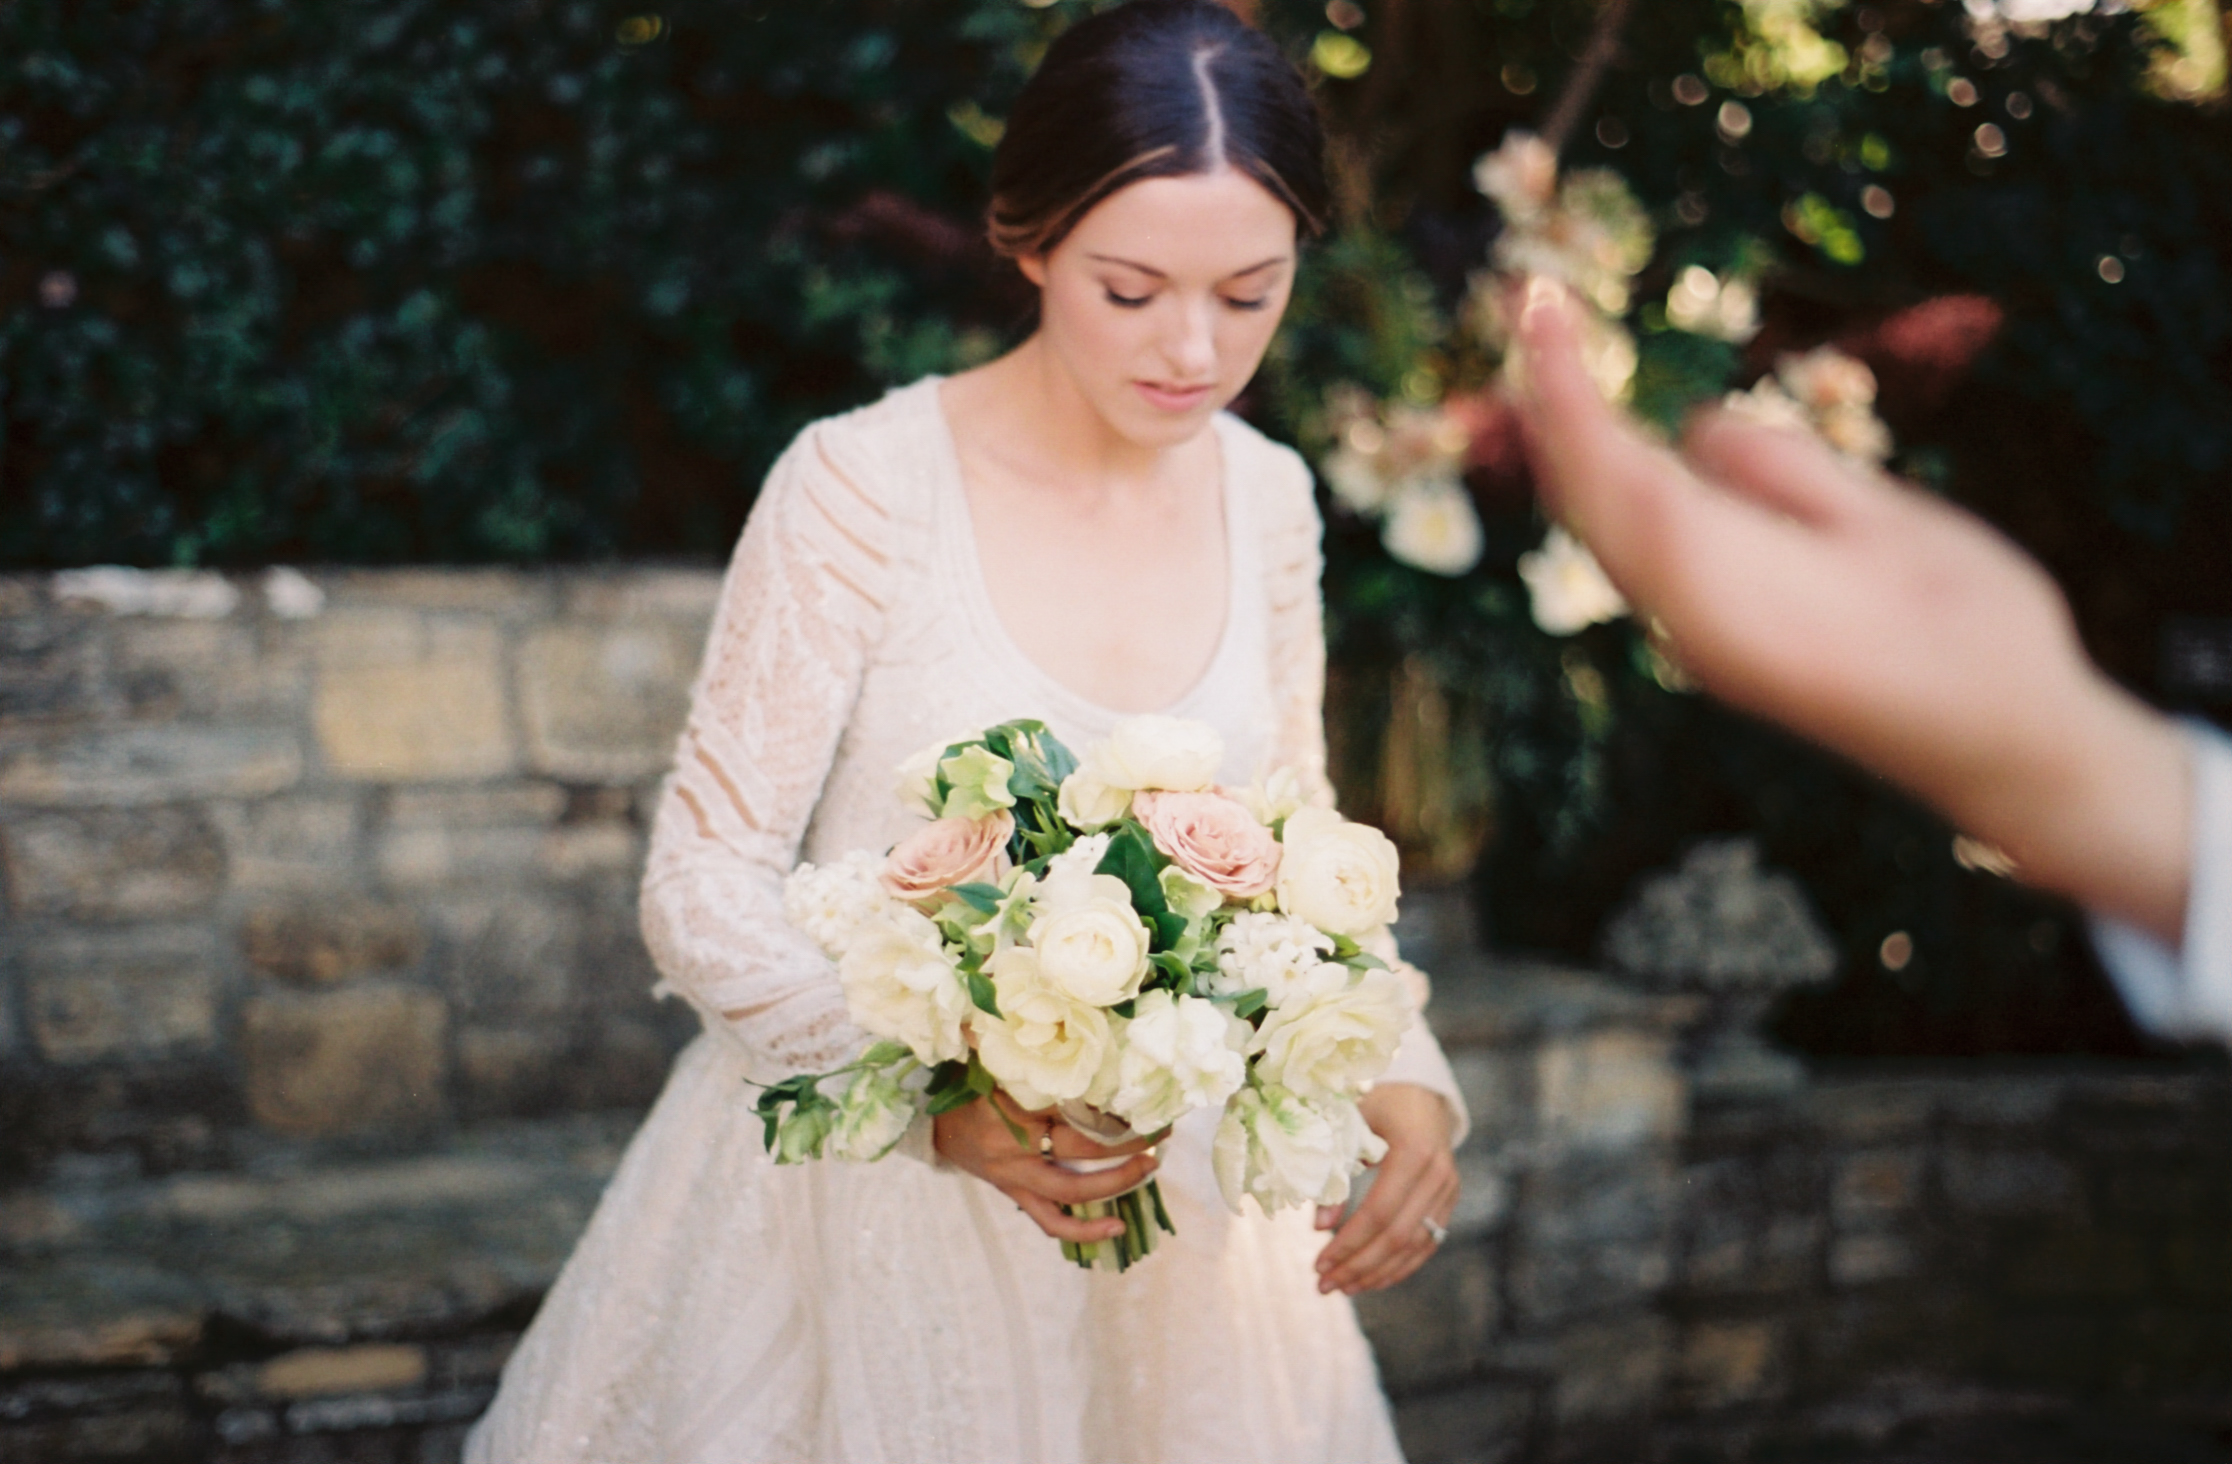 dottie morris_fine art film wedding photography-1.jpg